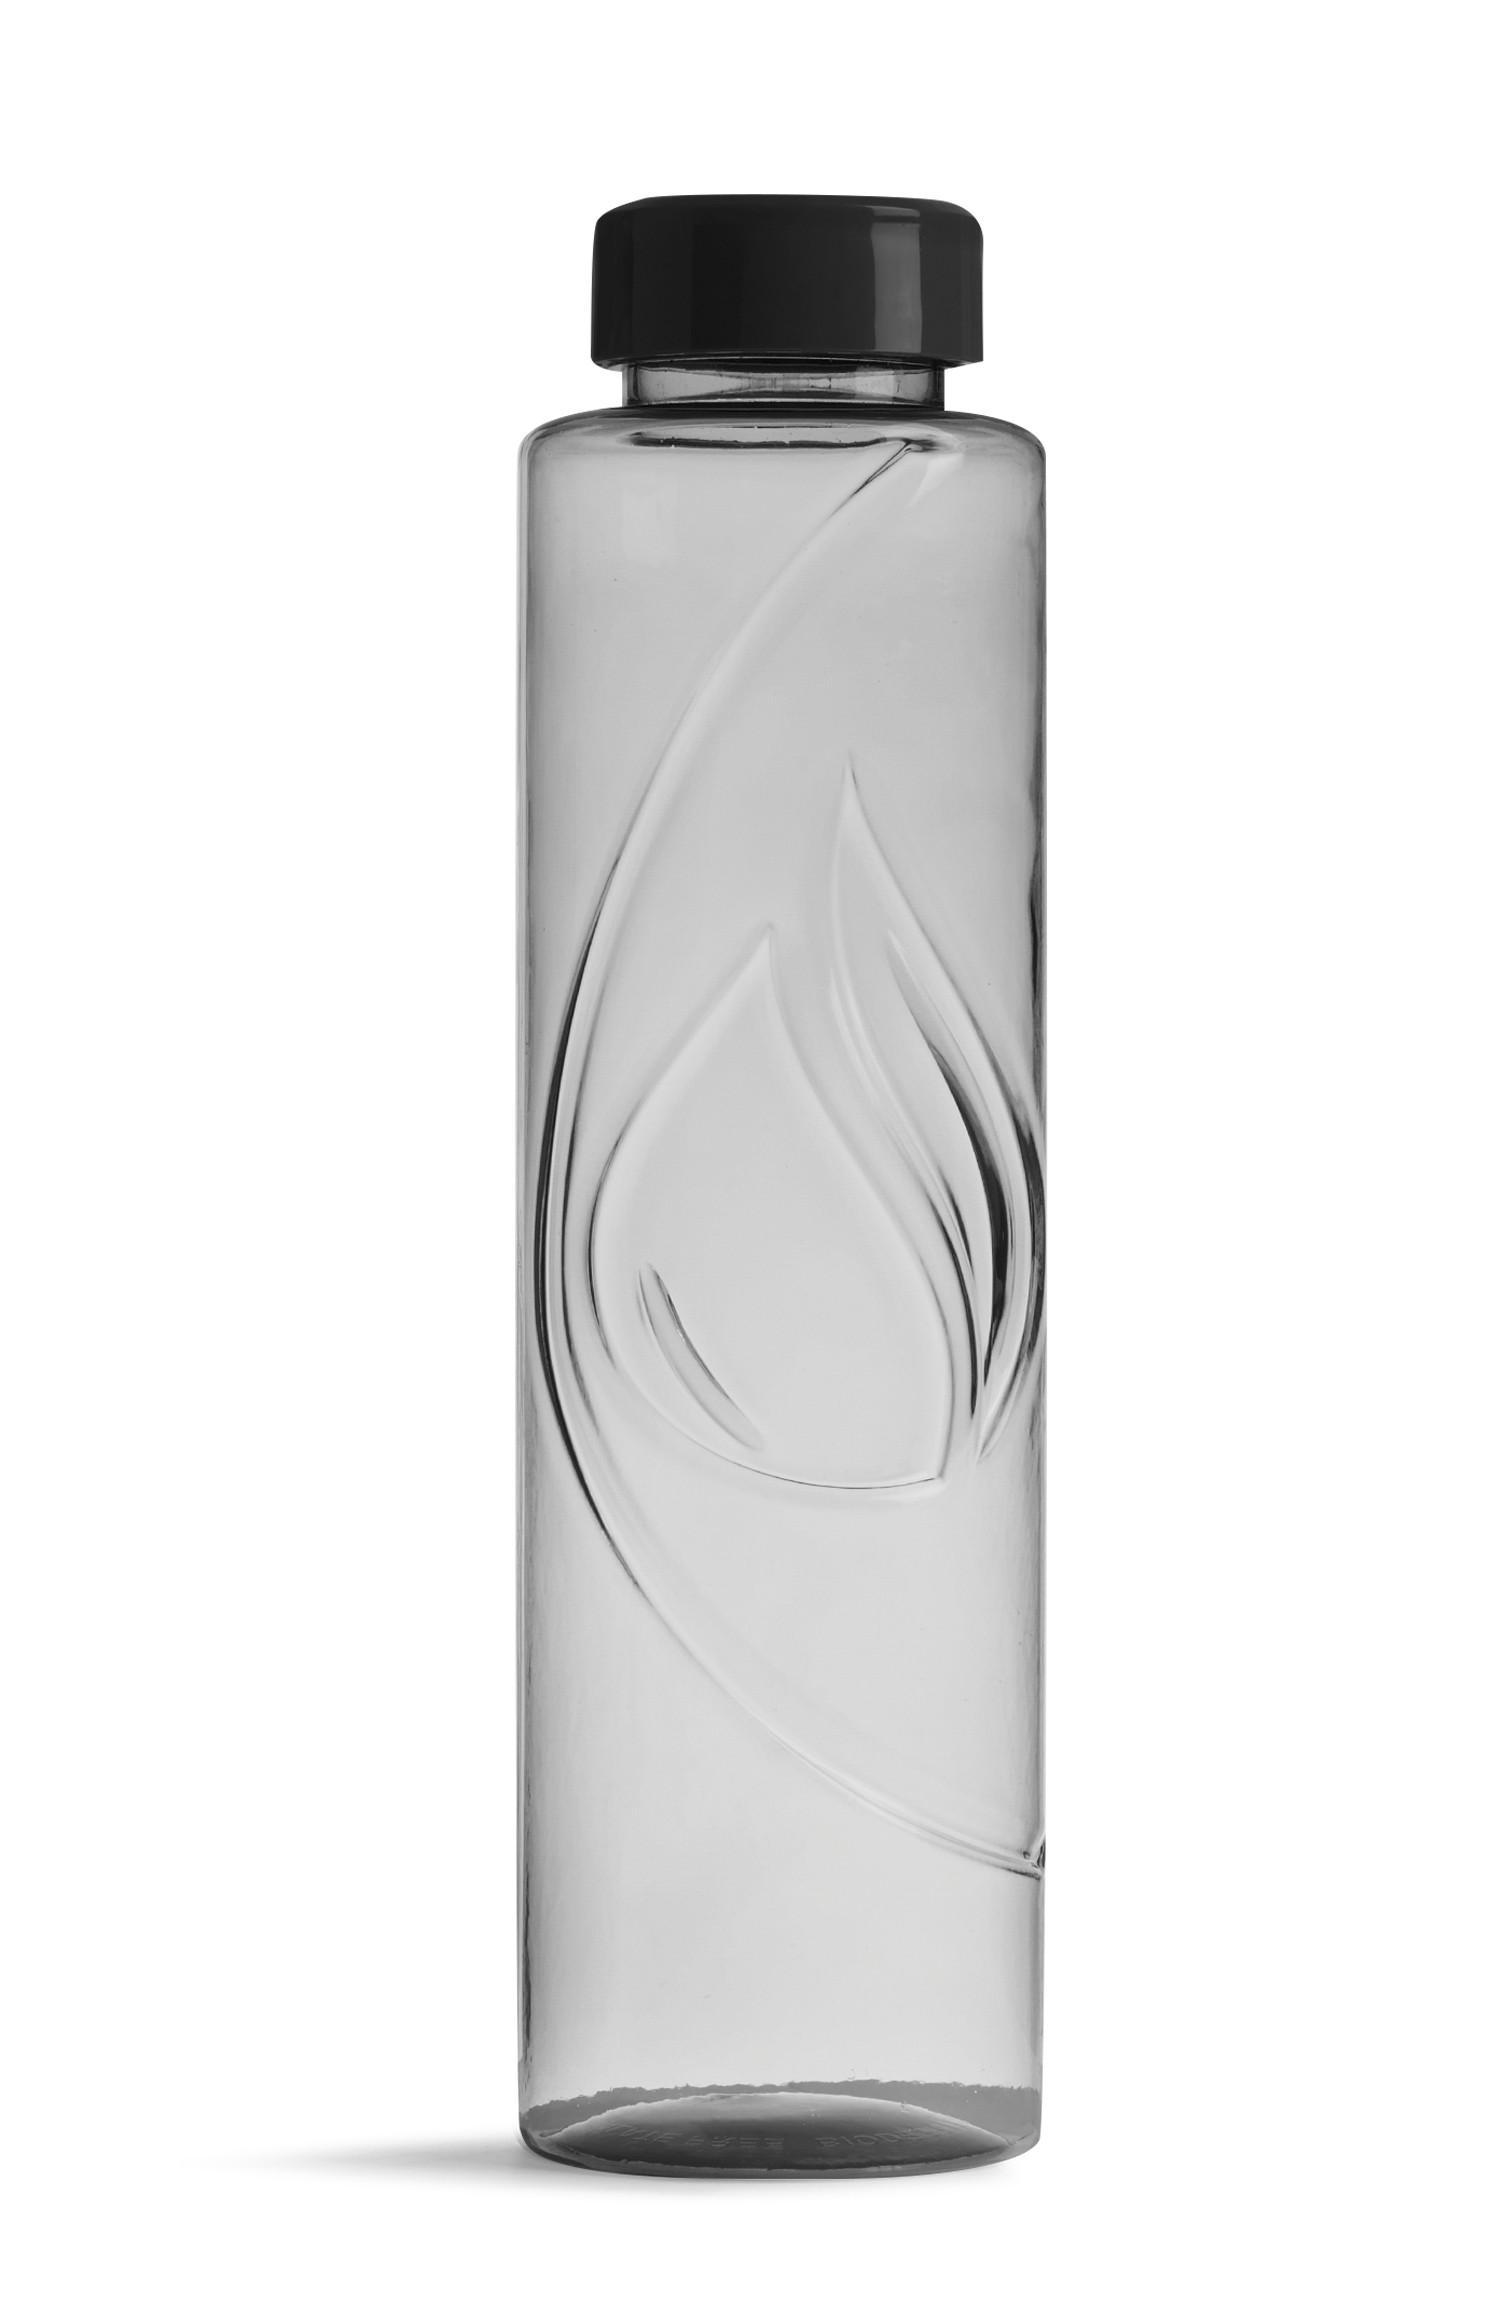 Botella gris biodegradable